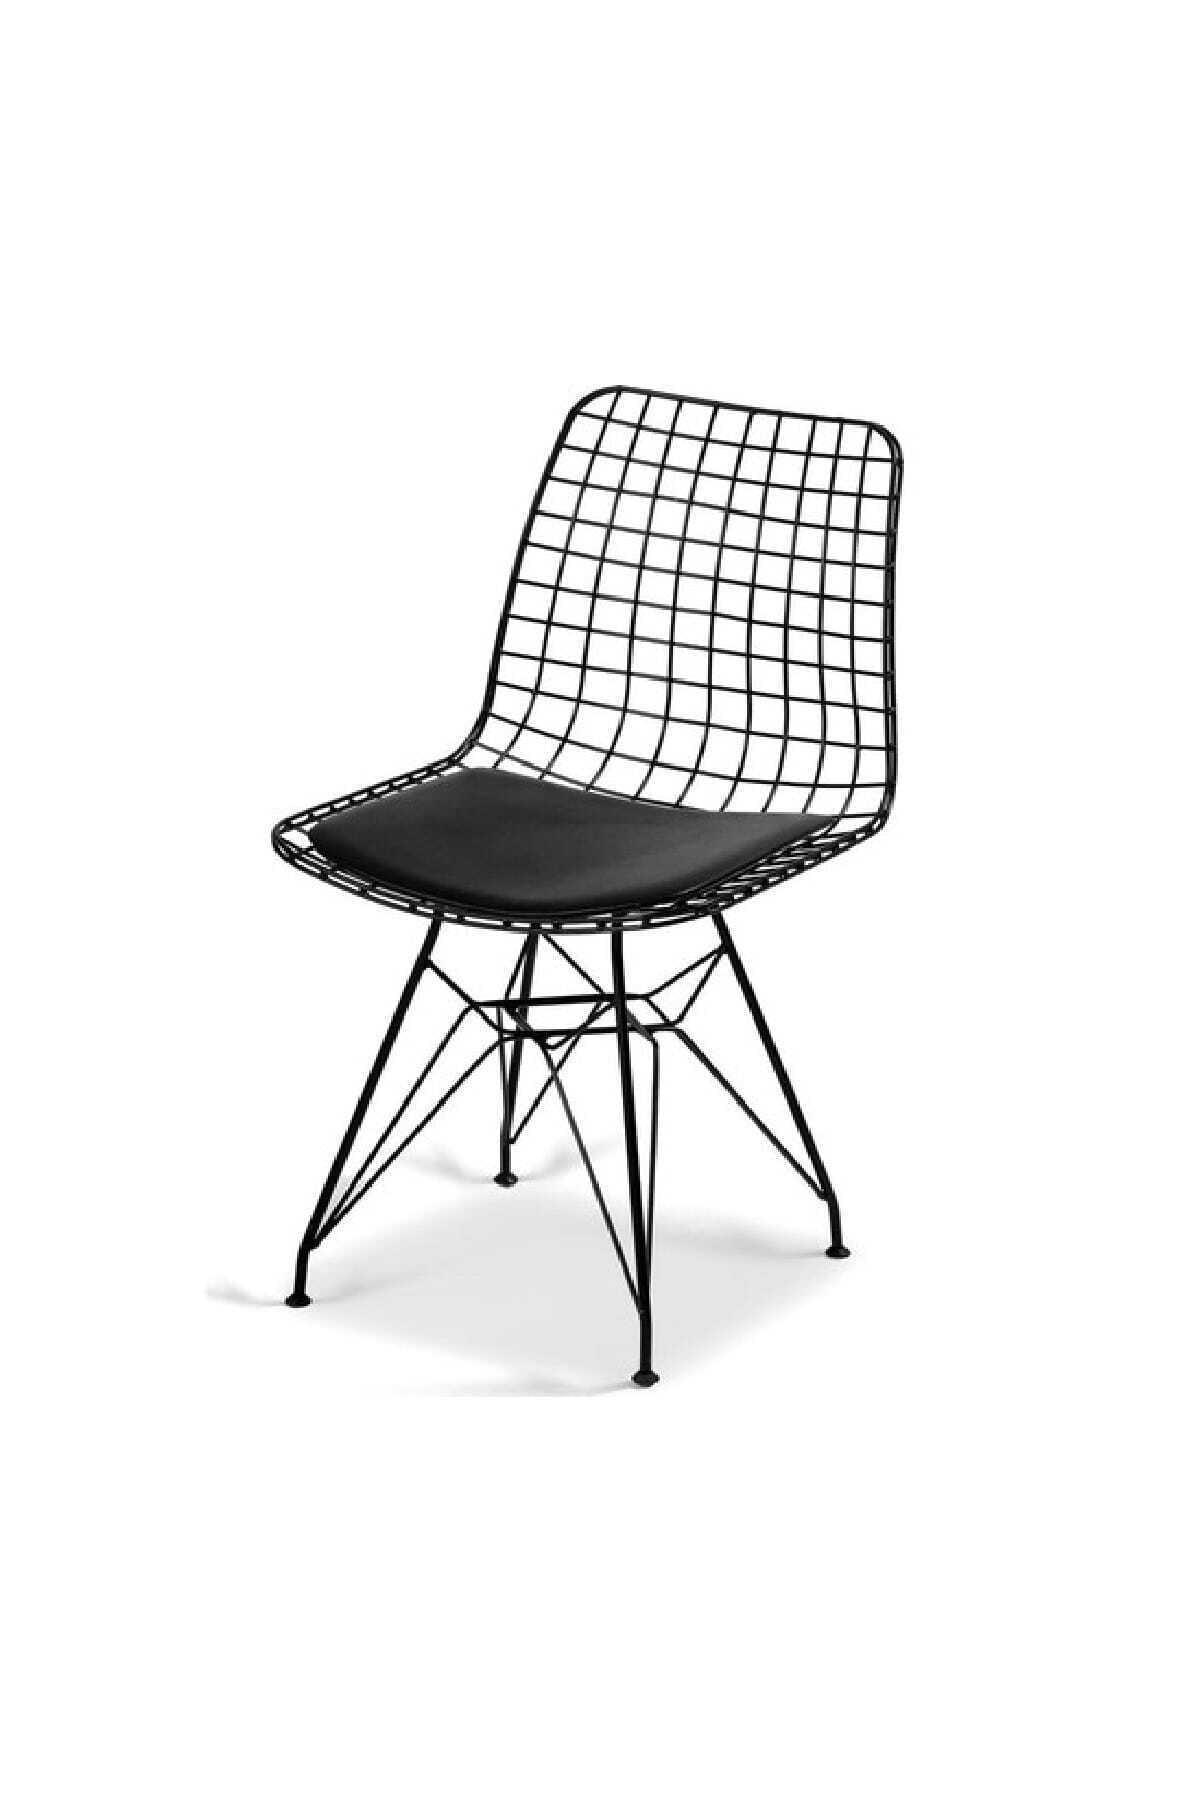 Evdemo Dekor Tel Sandalye Siyah 1